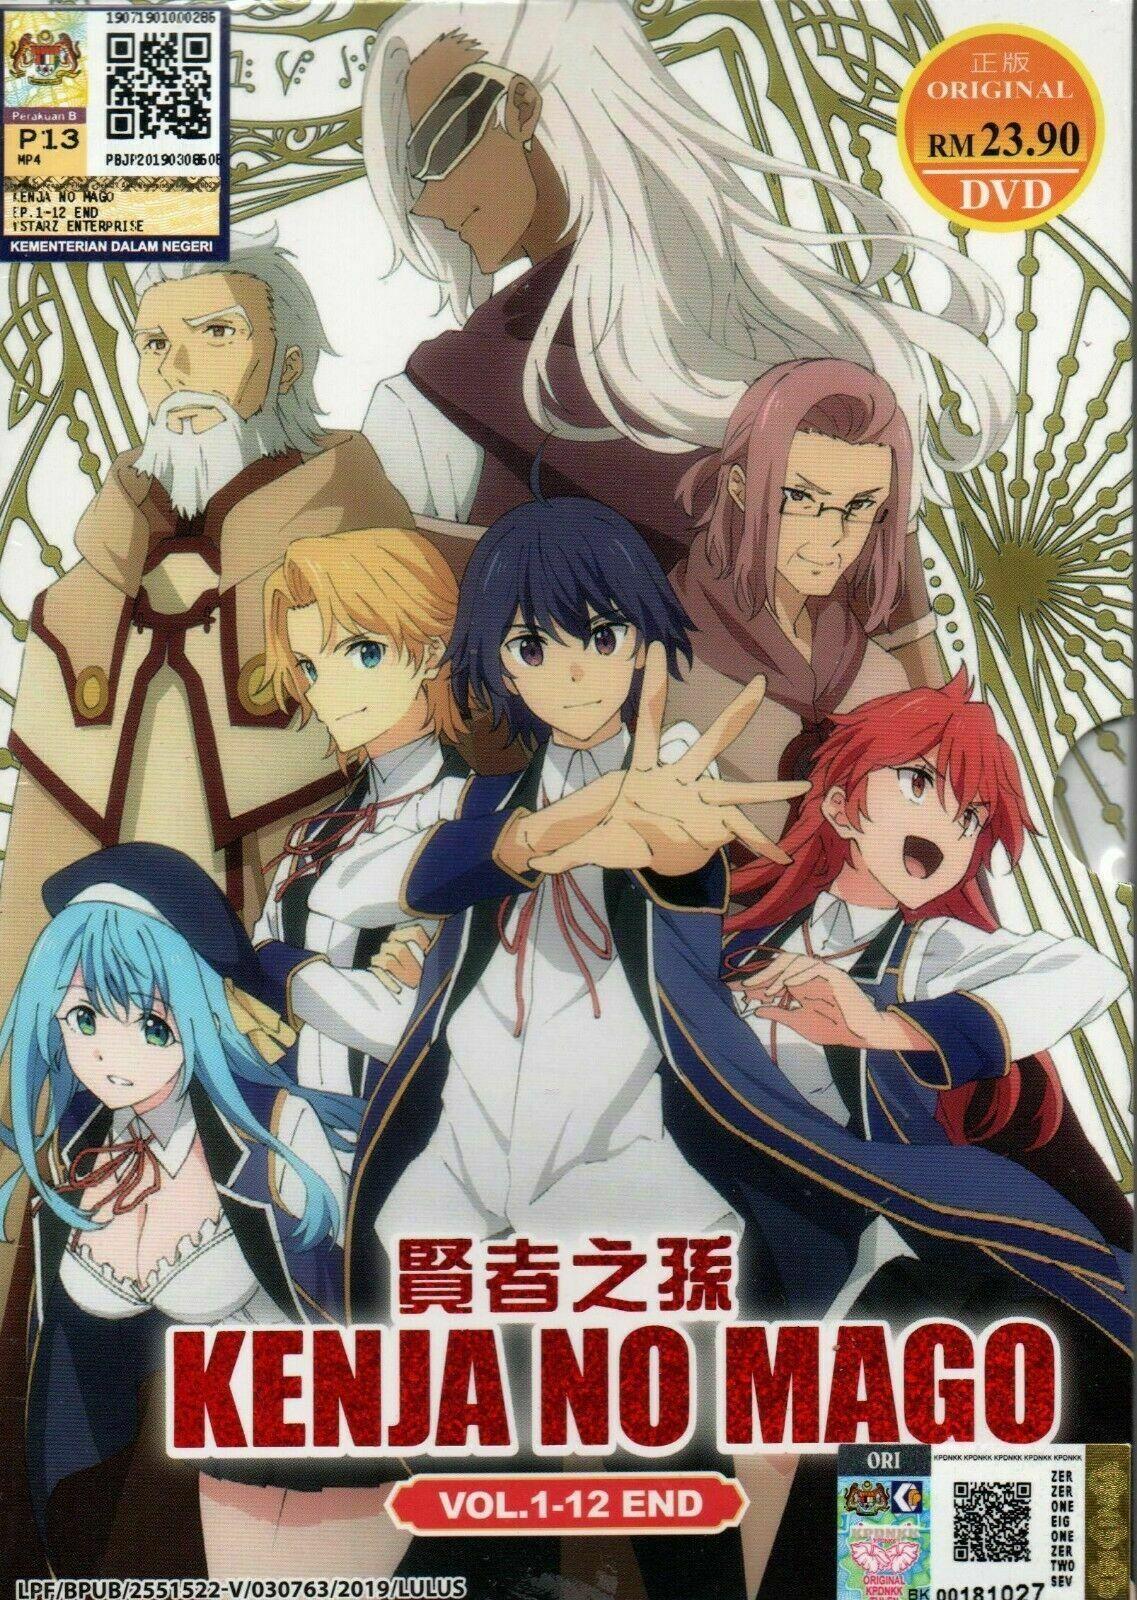 Kenja No Mago Vol.1-12 End English Dubbed Ship From USA